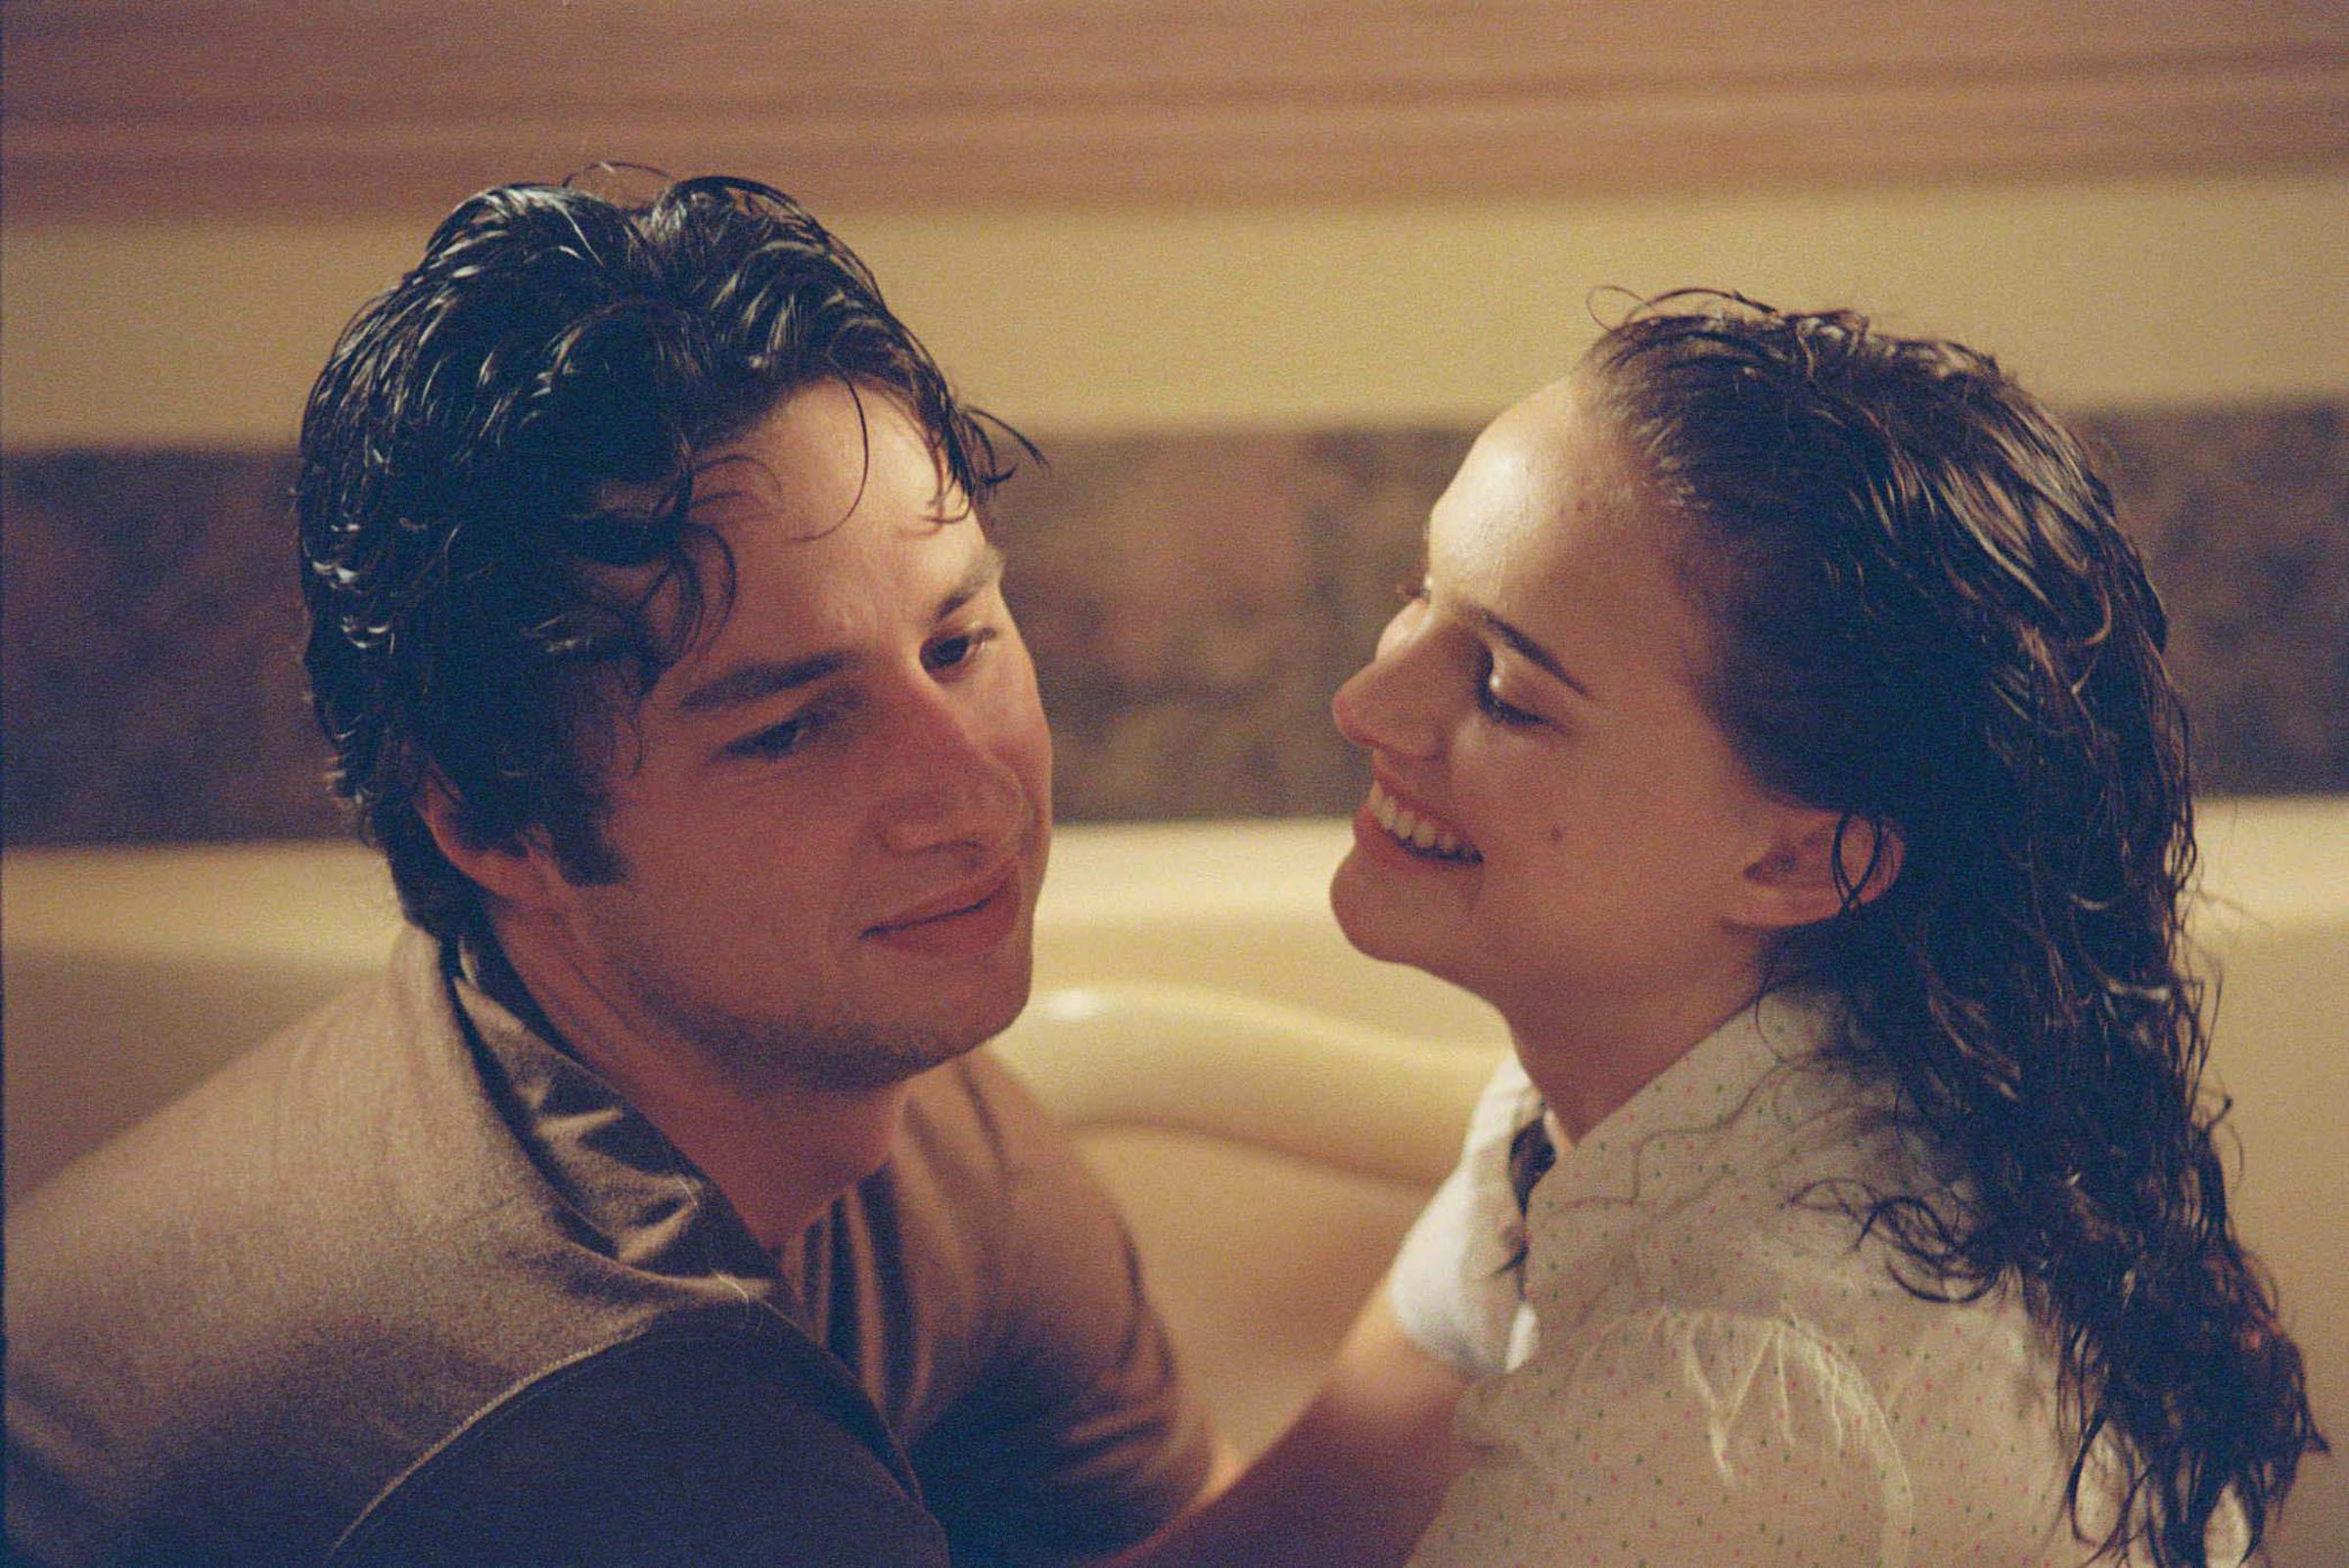 Scene rencontre amoureuse film